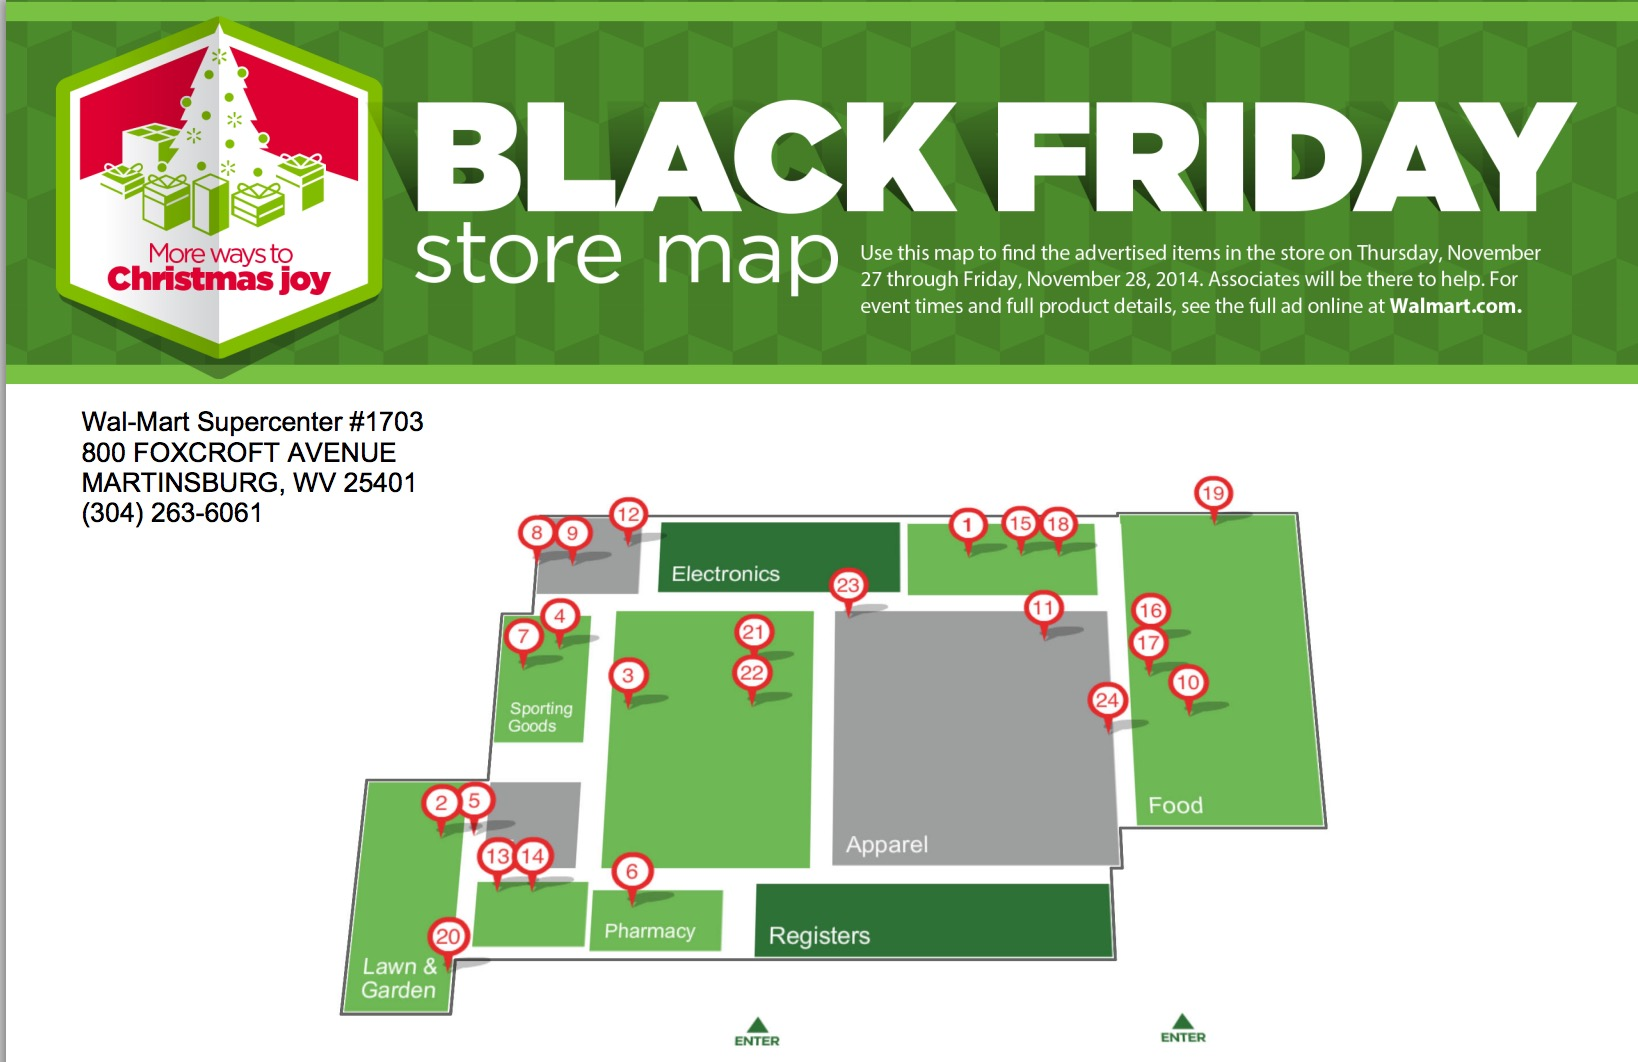 Walmart-Black-Friday-Store-Map.jpg